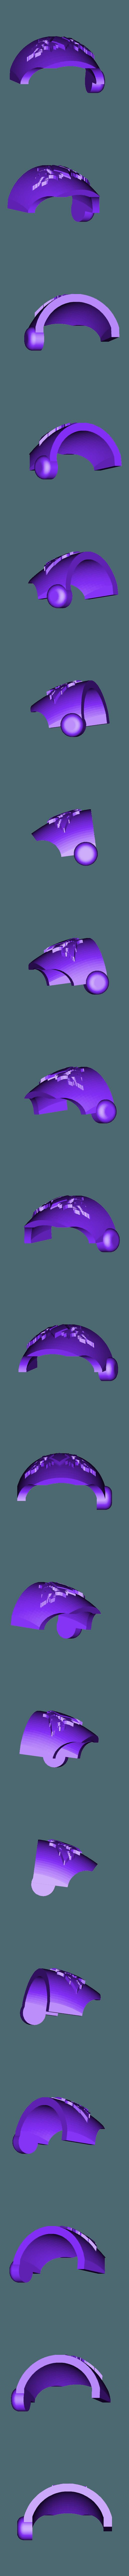 Tartaros_-_Wolf_1.stl Download free STL file Legion of the Wolf - Marine Upgrade Pack • 3D printer object, GarinC3D